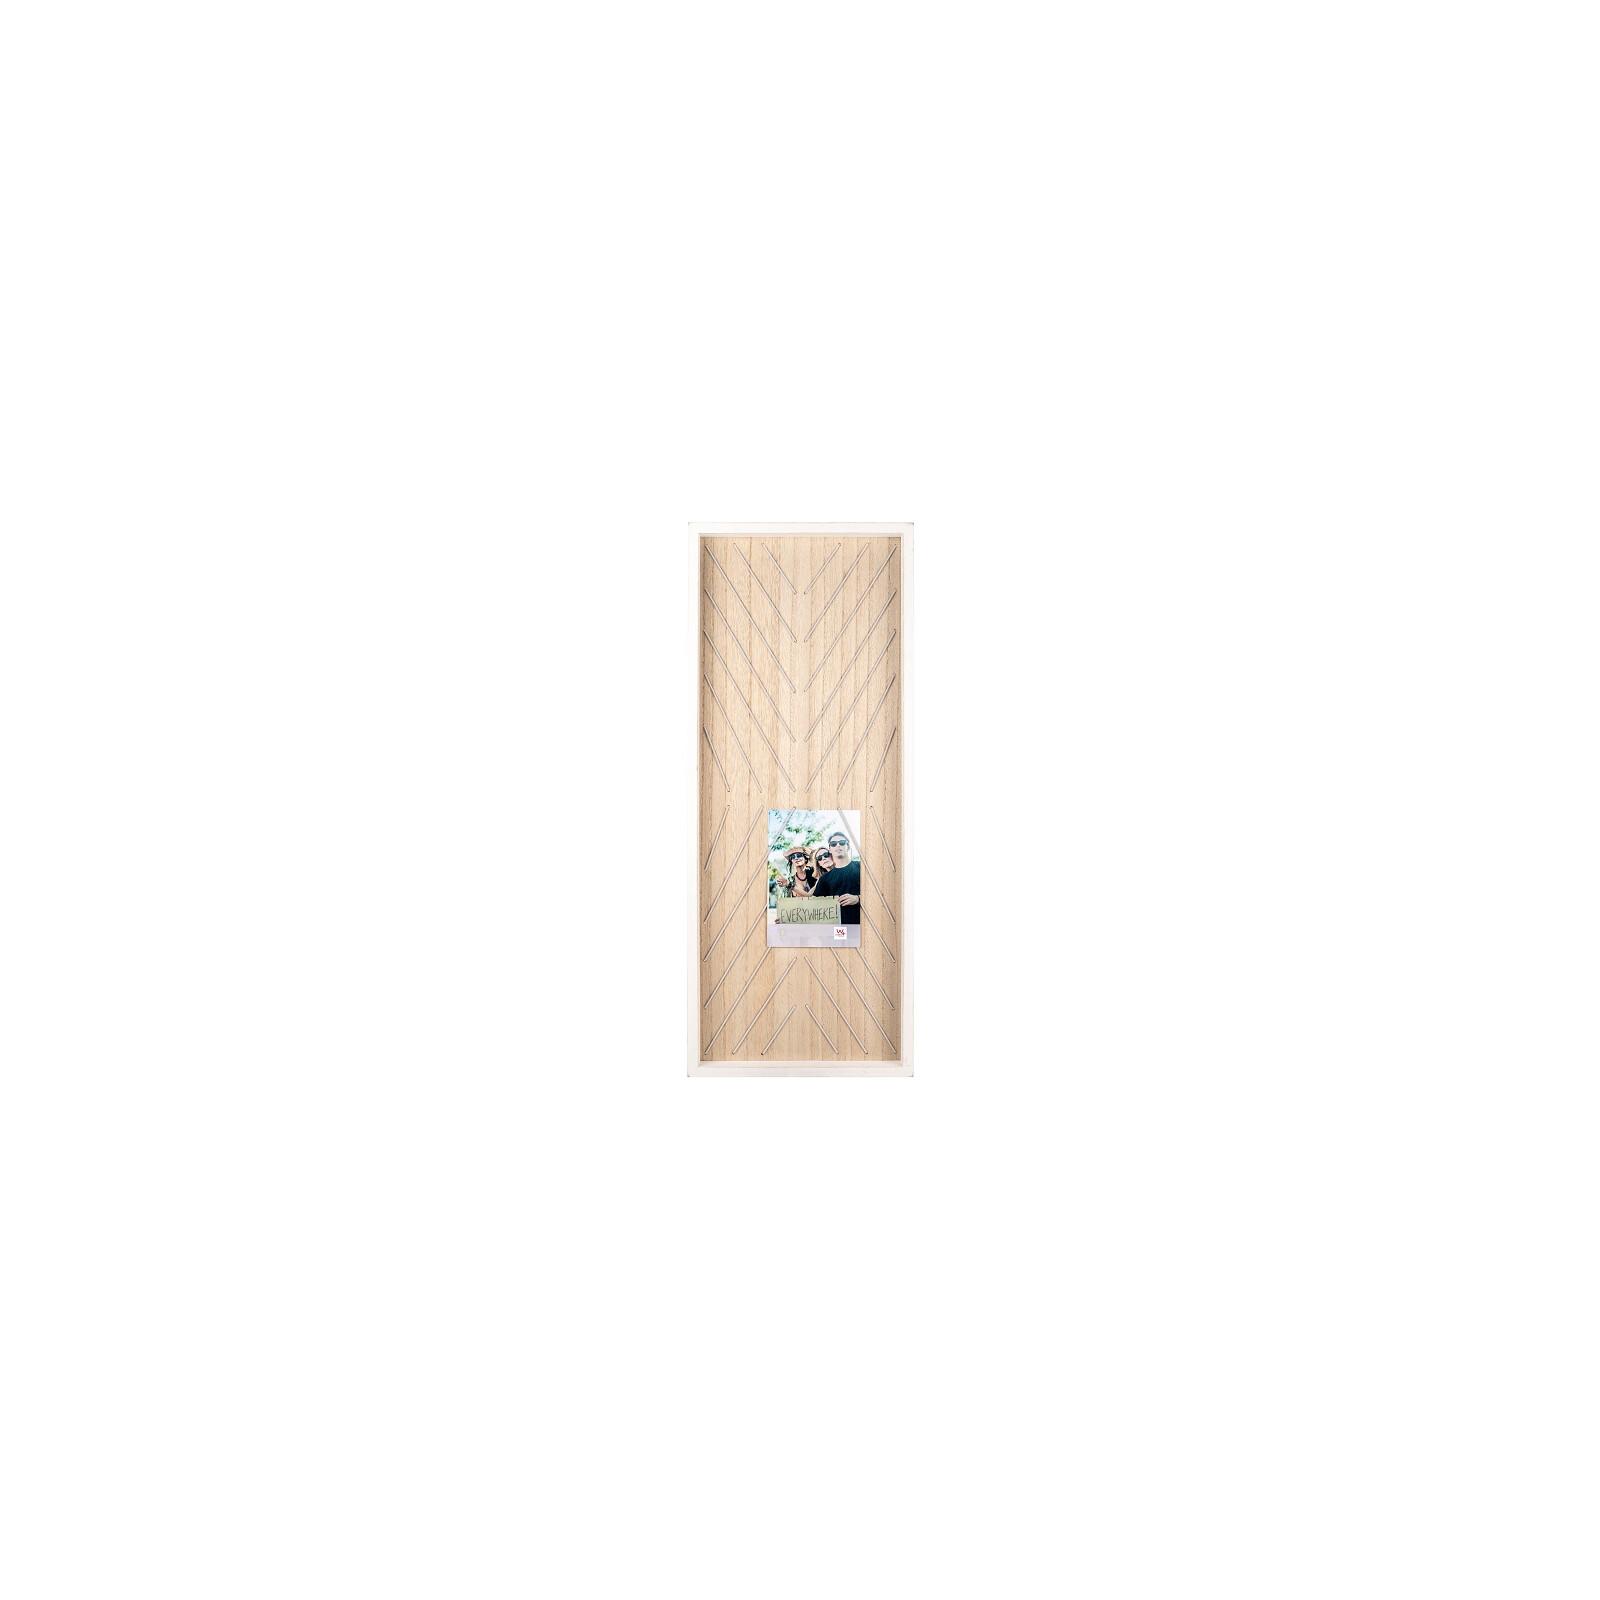 Everywhere 24x60 Holz weiß